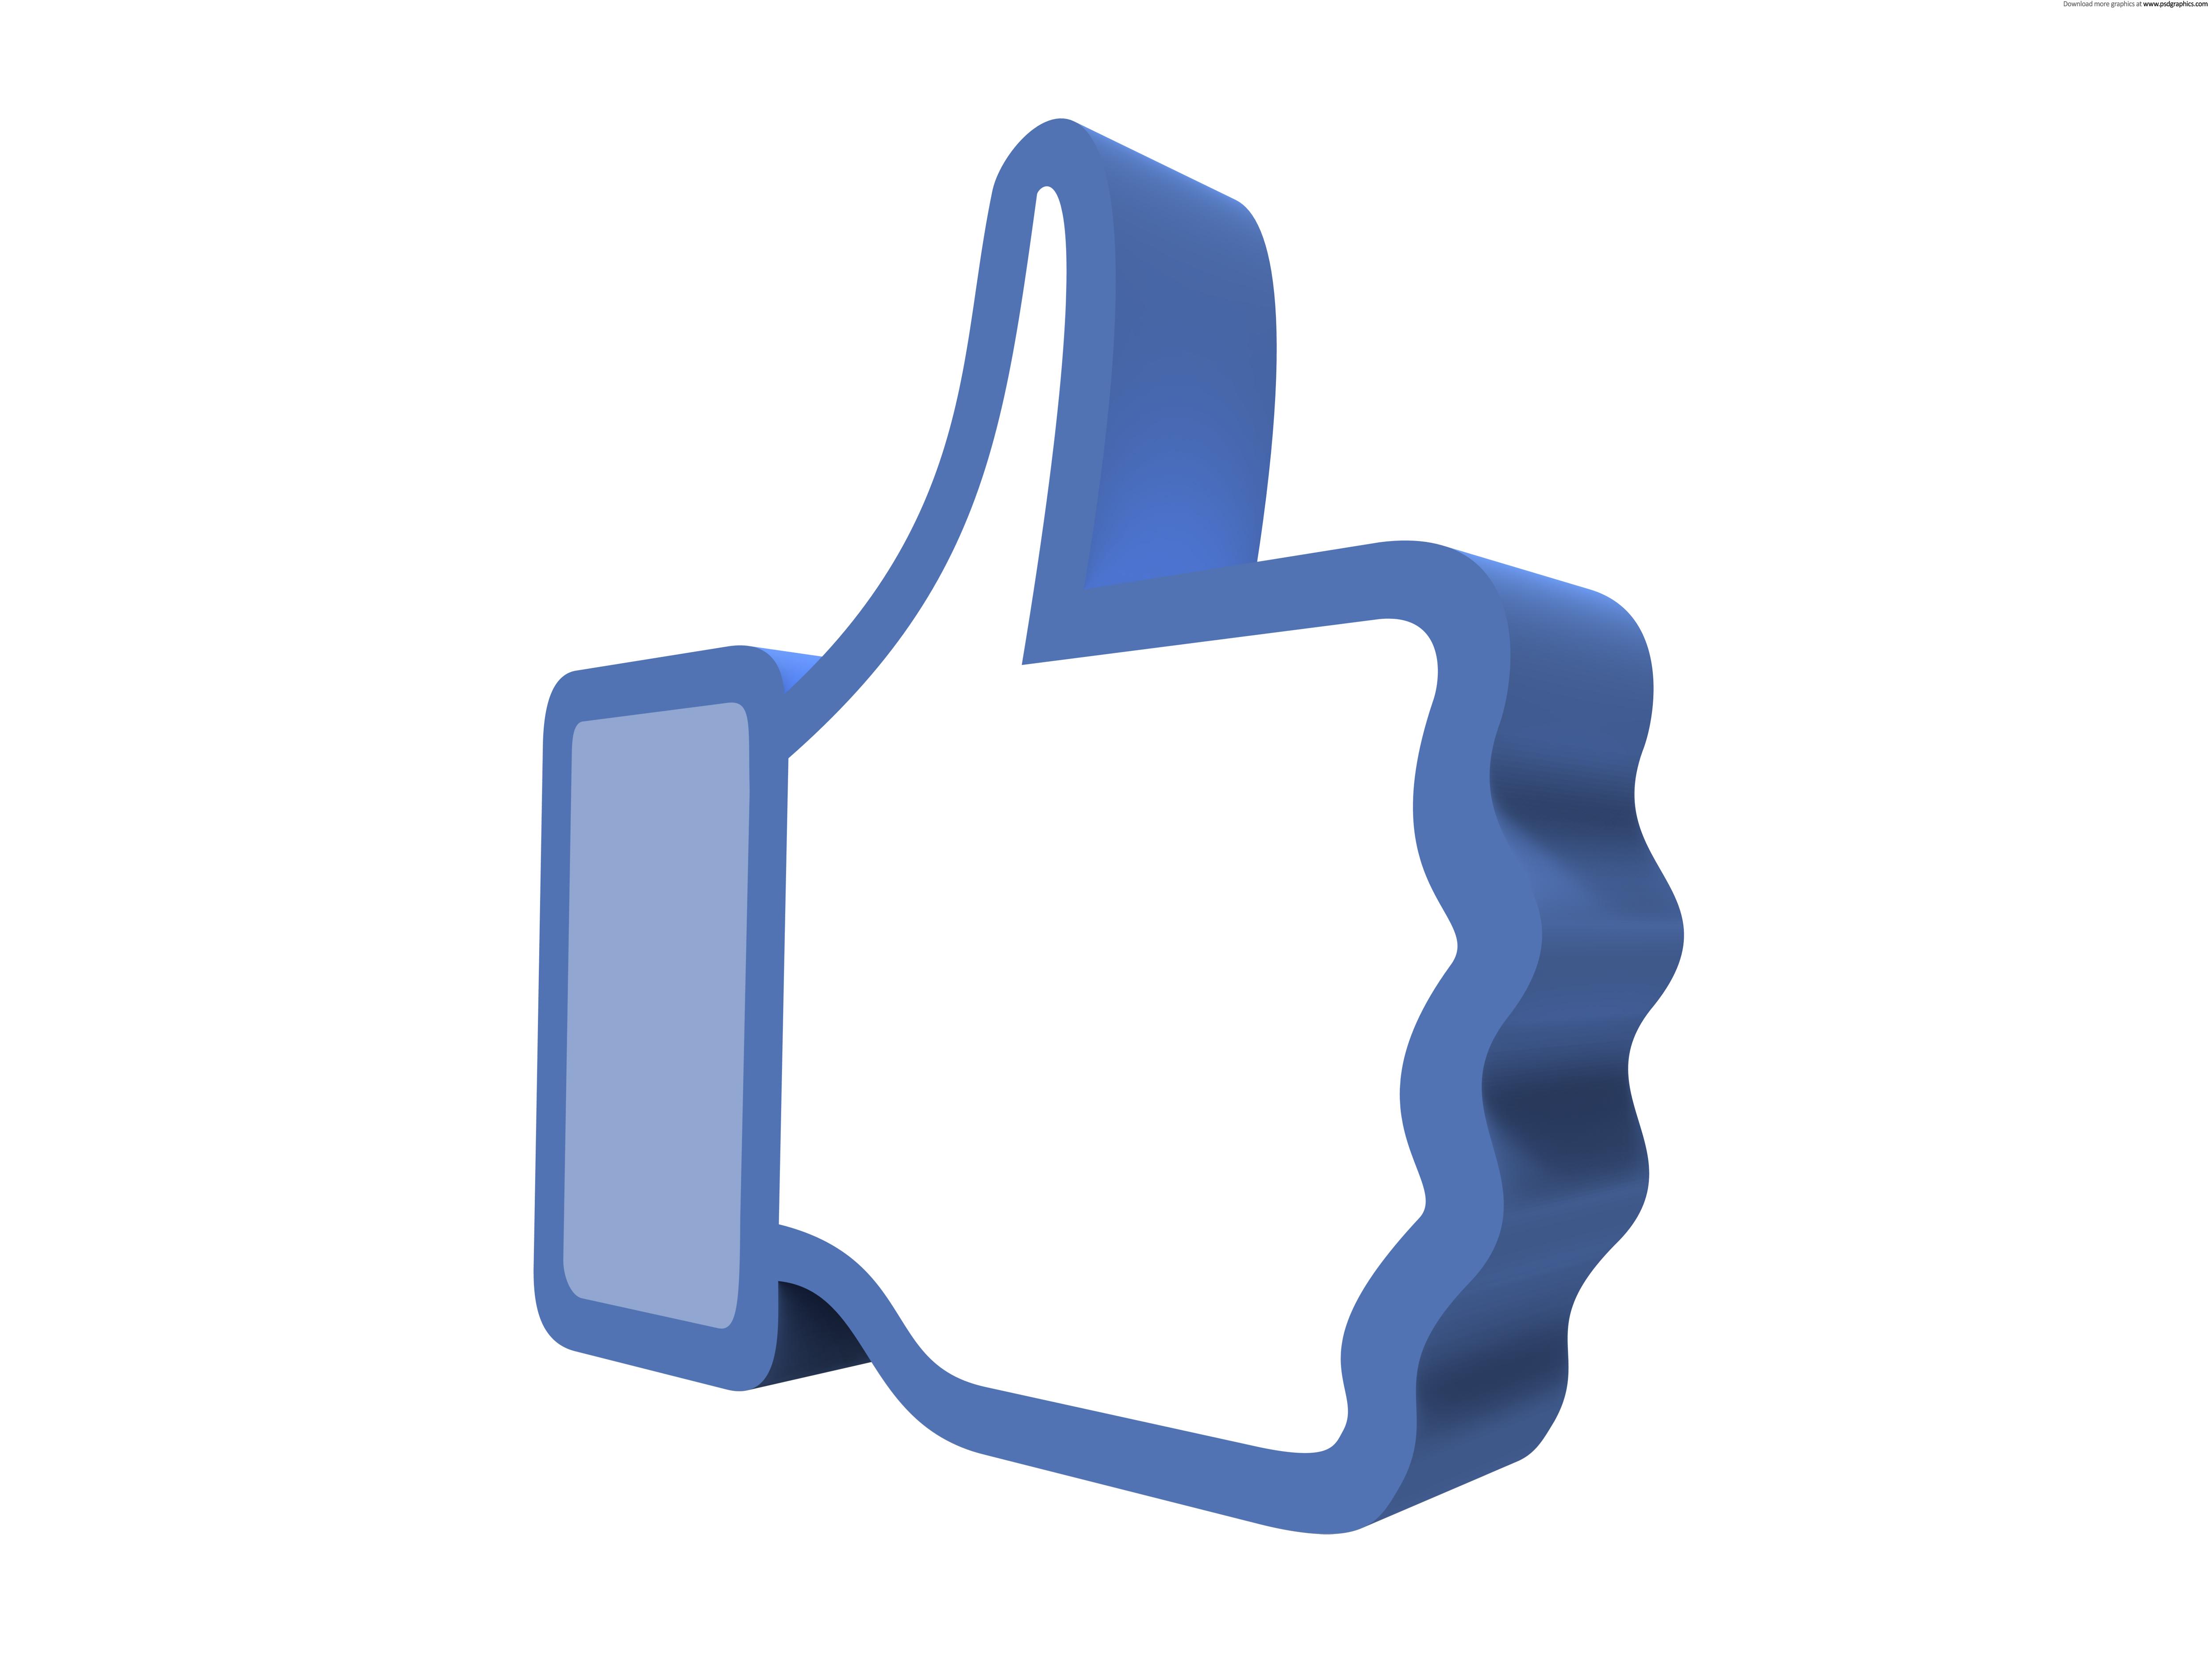 5000x3750 Facebook Like Button Clipart